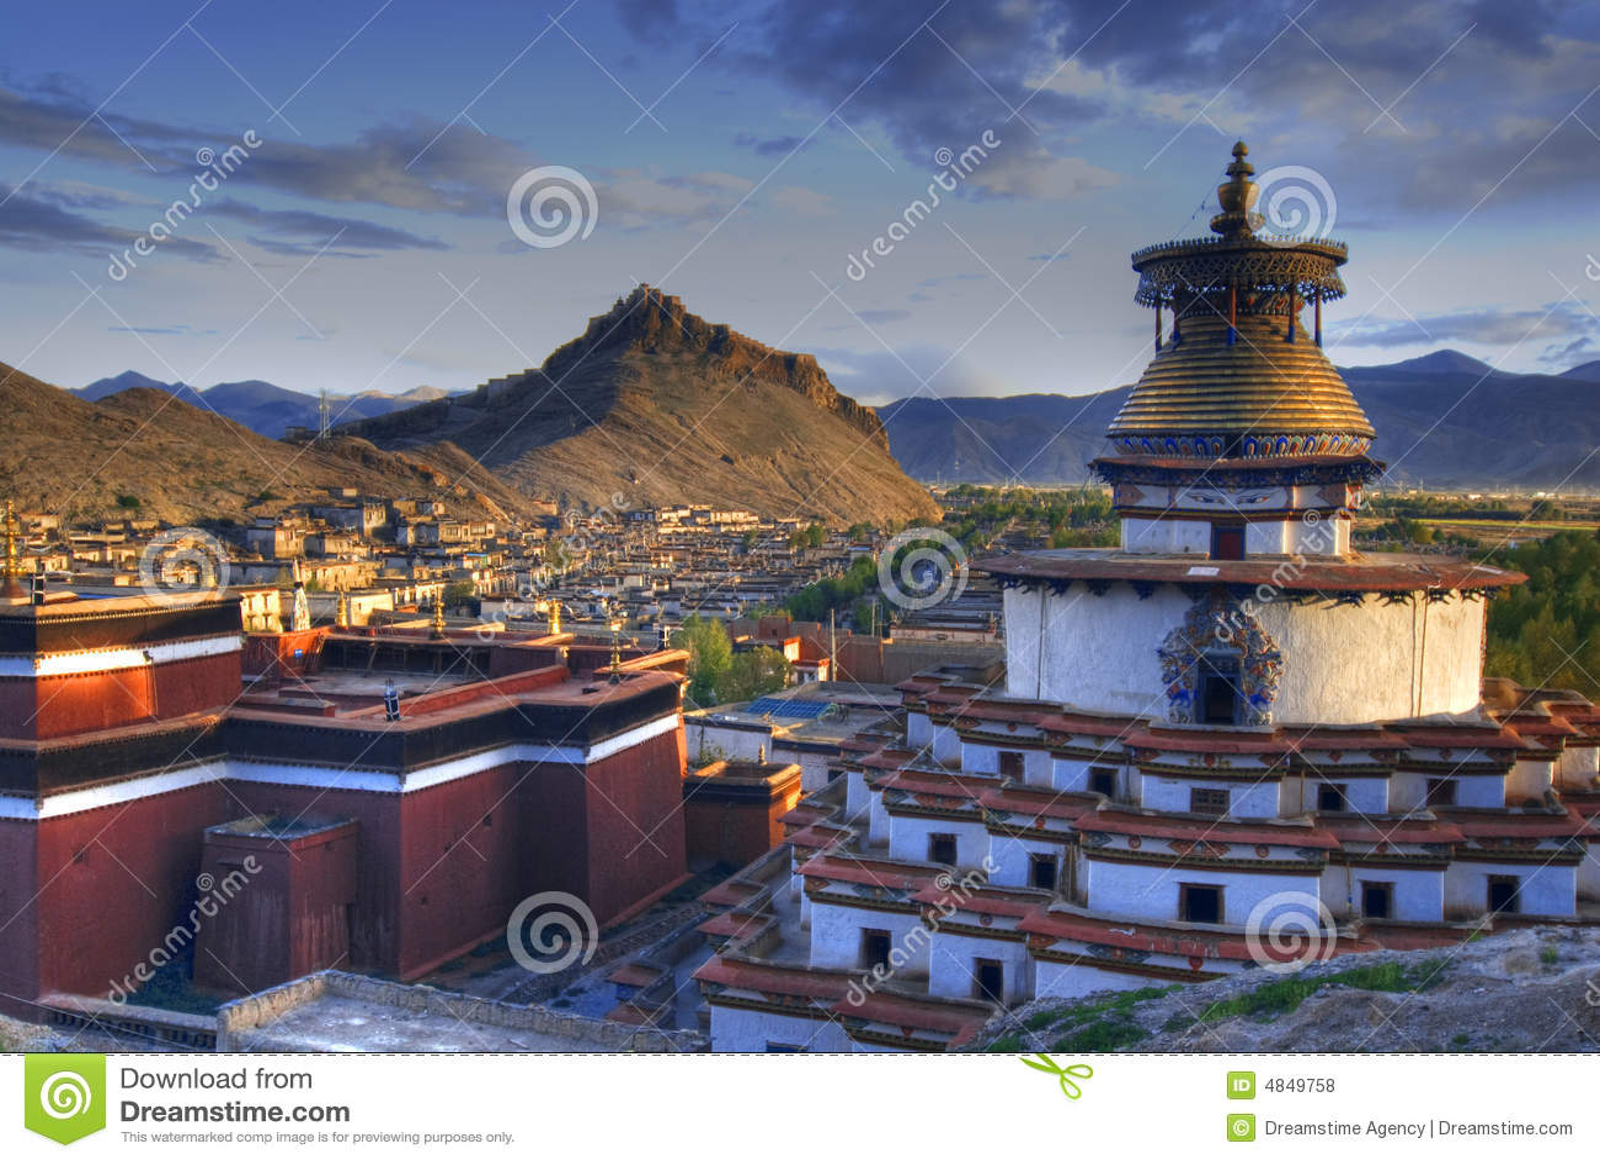 Monastero nel paesaggio tibetano